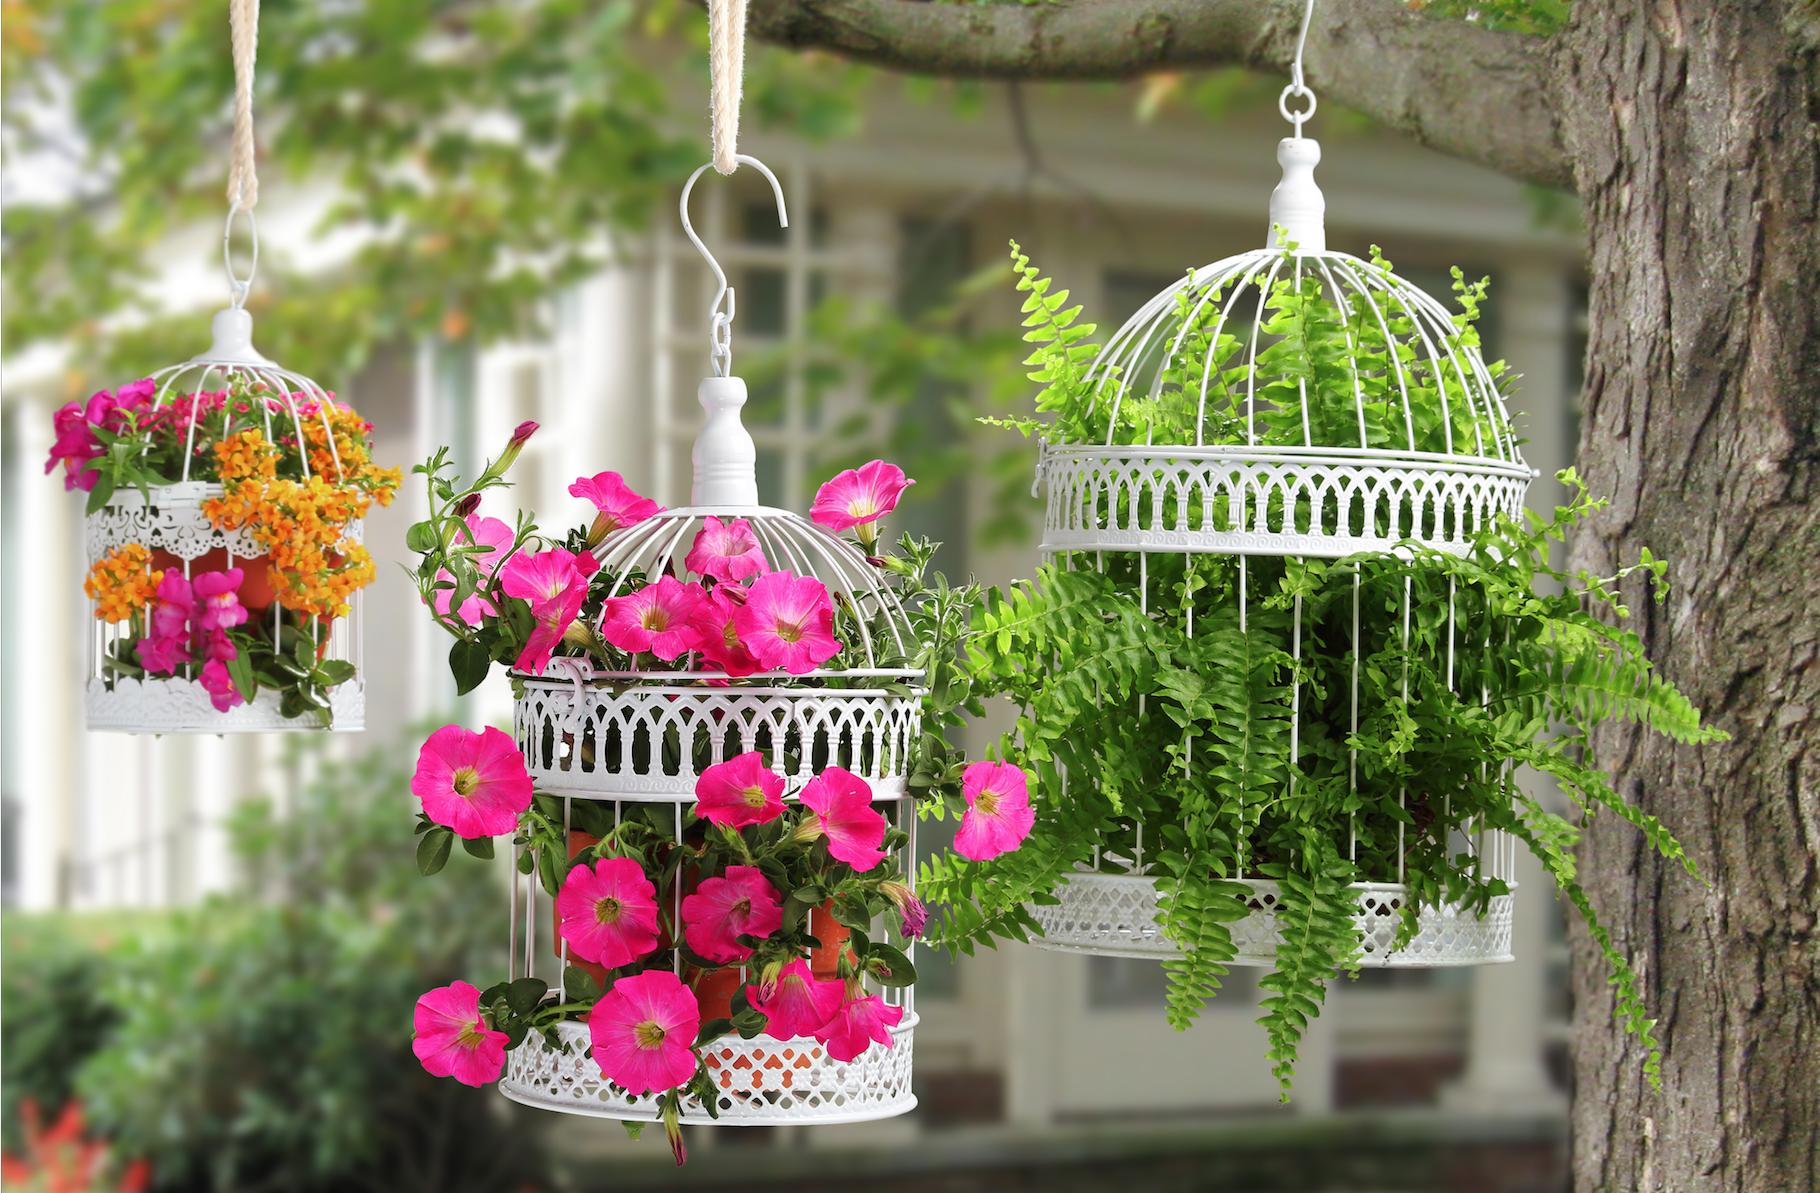 Pin de sharai gonzalez nieto en flower garden pinterest for Setas decorativas para jardin